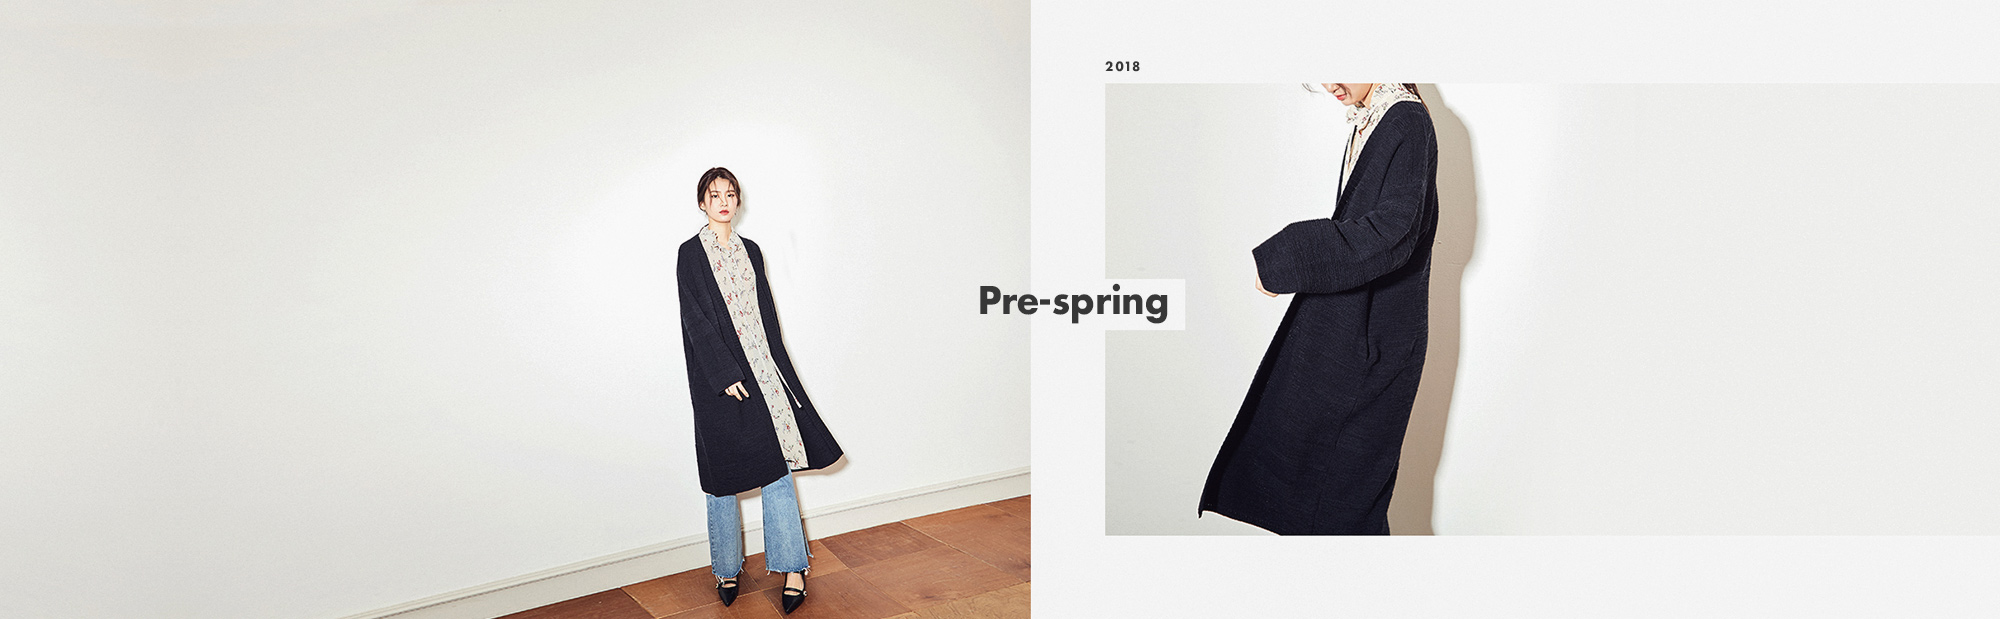 pre-spring